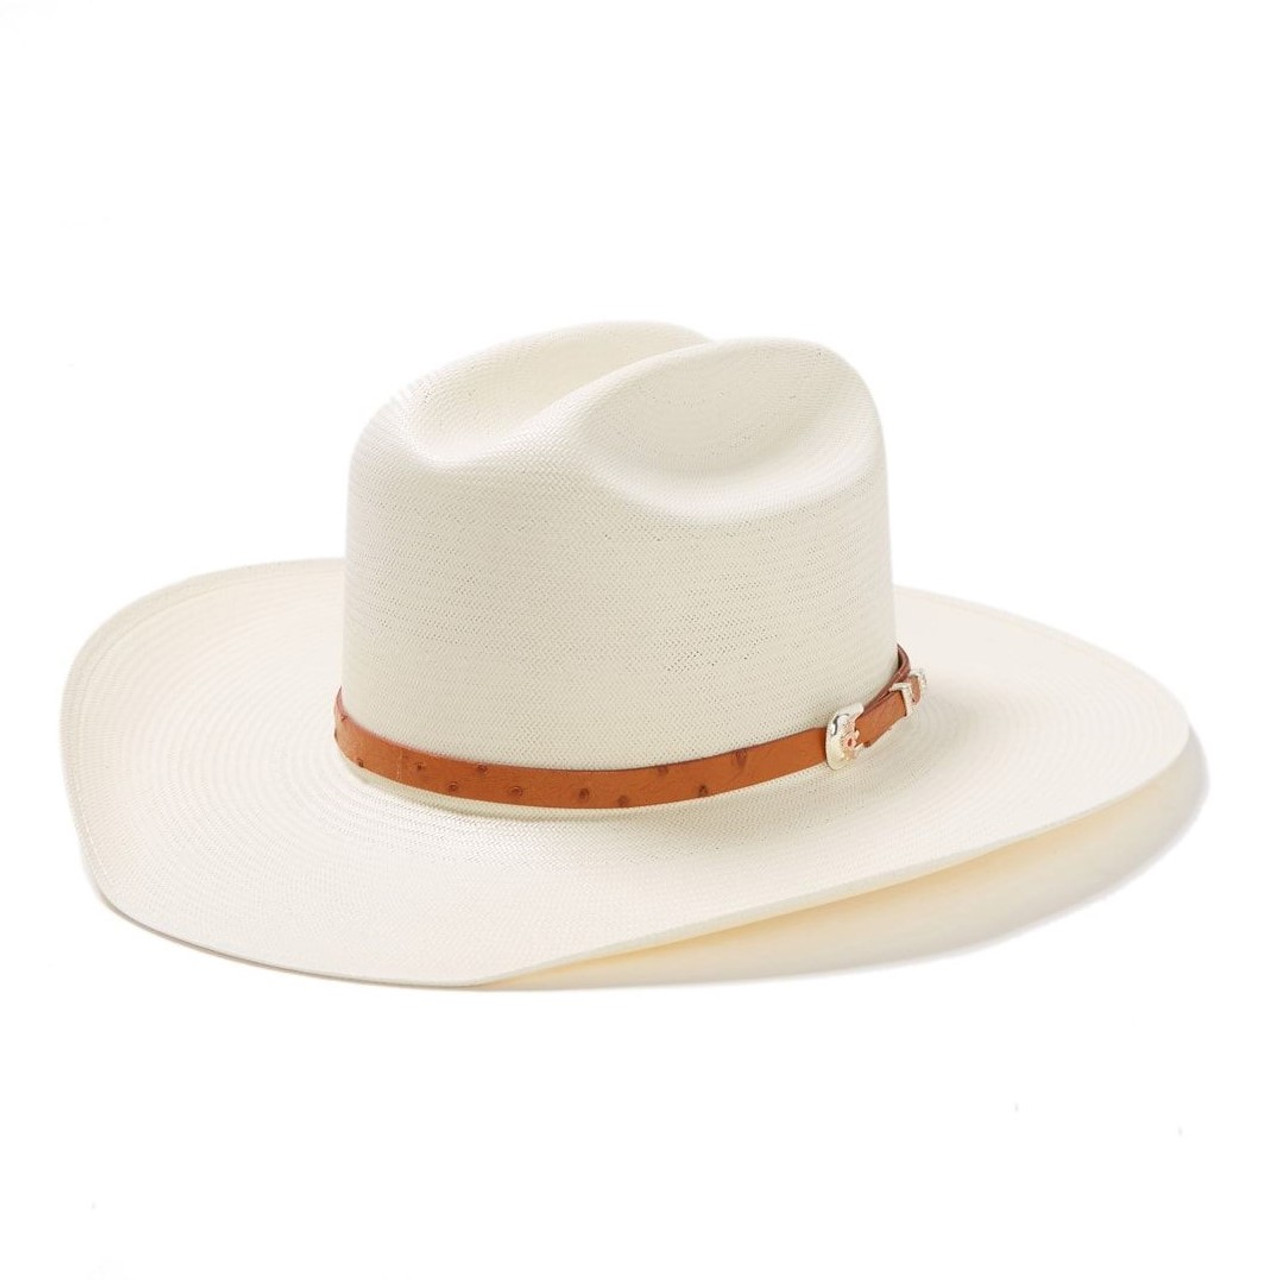 Stetson Mens Hats - El Noble - 500X Straw Cowboy Hat - Billy s ... 0b0e5230d25